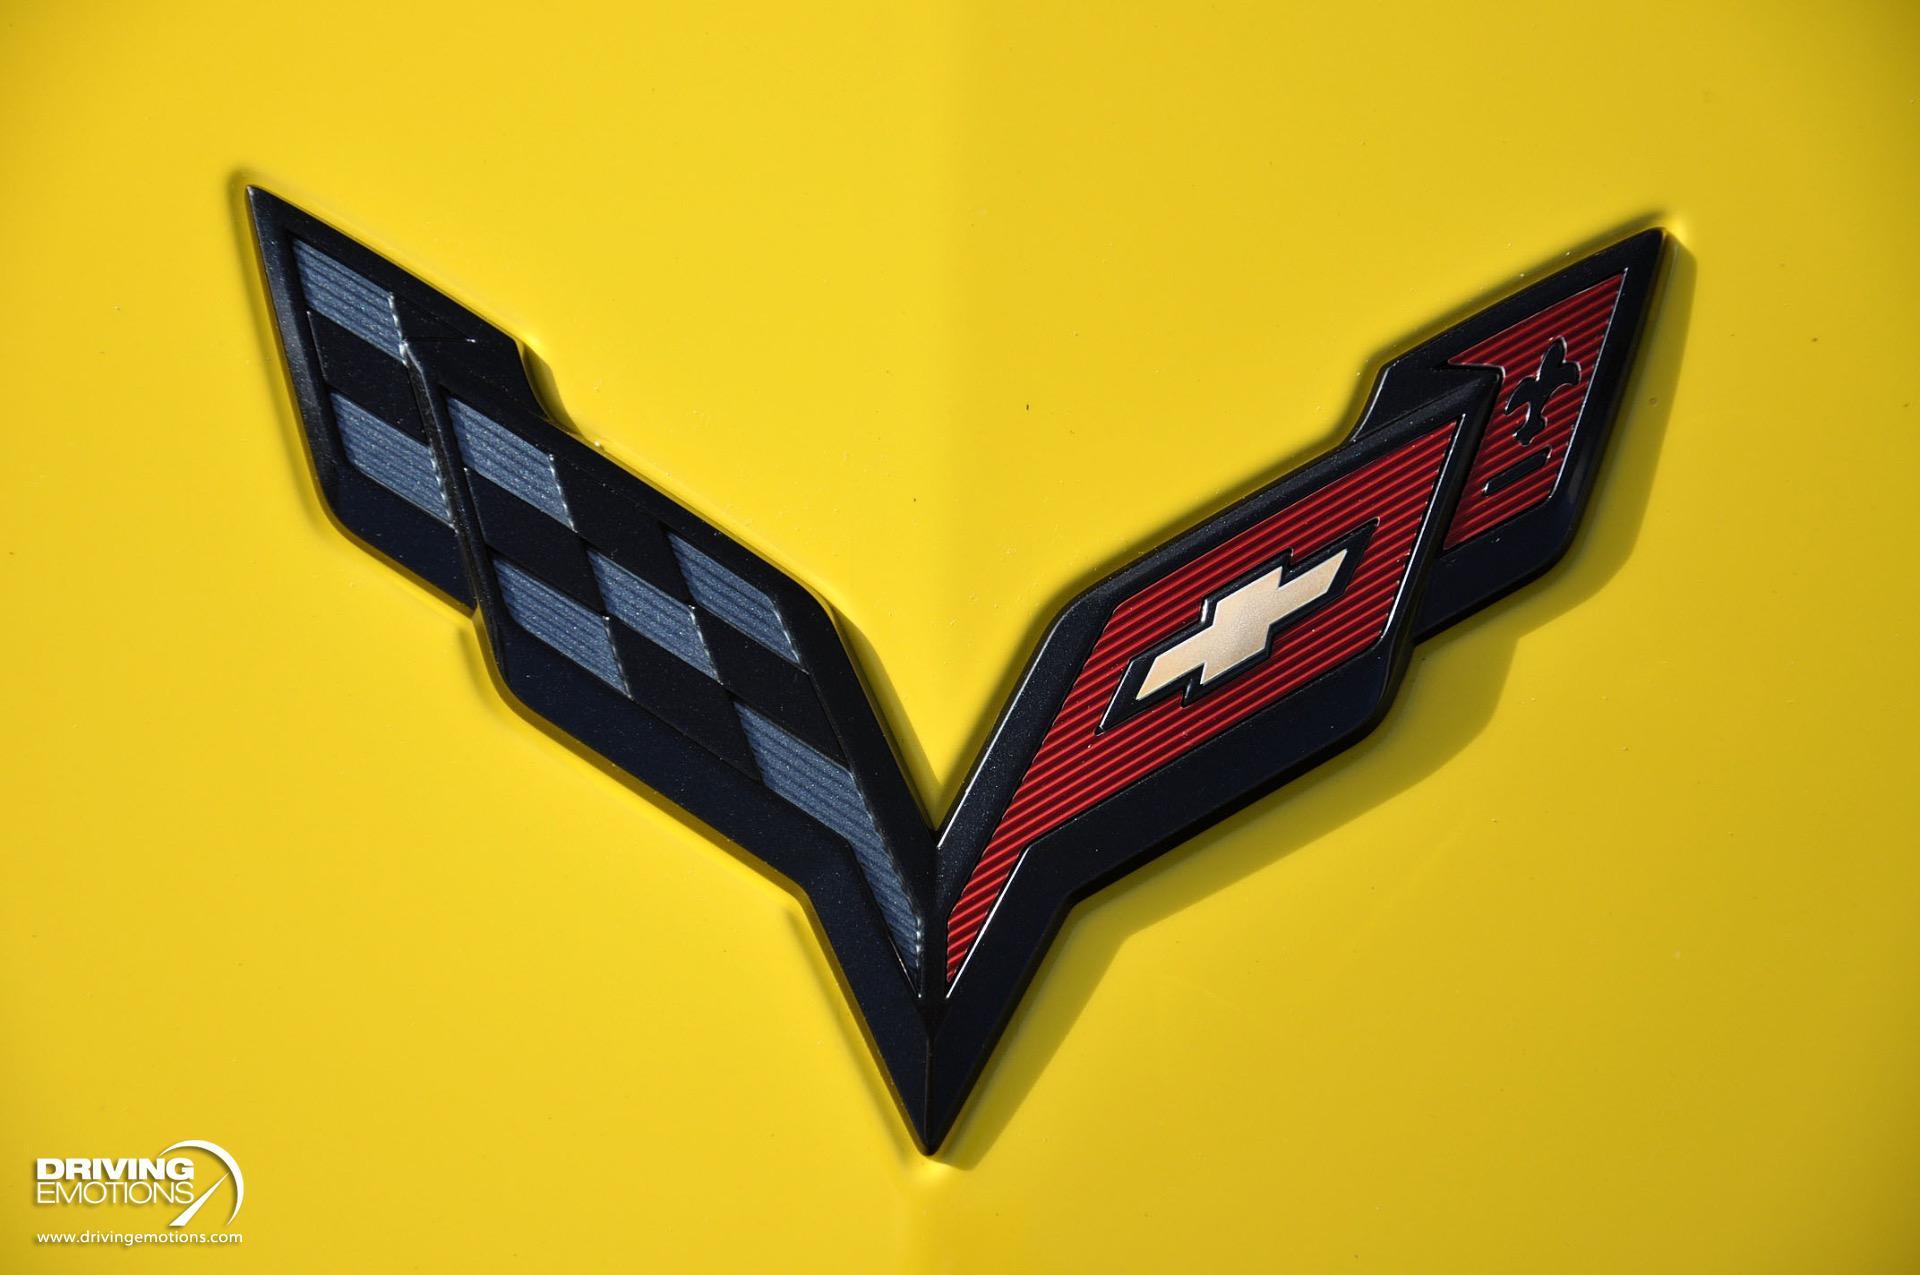 Used 2019 Chevrolet Corvette Z06 Coupe Z06 3LZ Hertz 100th Anniversary 23 of 100!! | Lake Park, FL